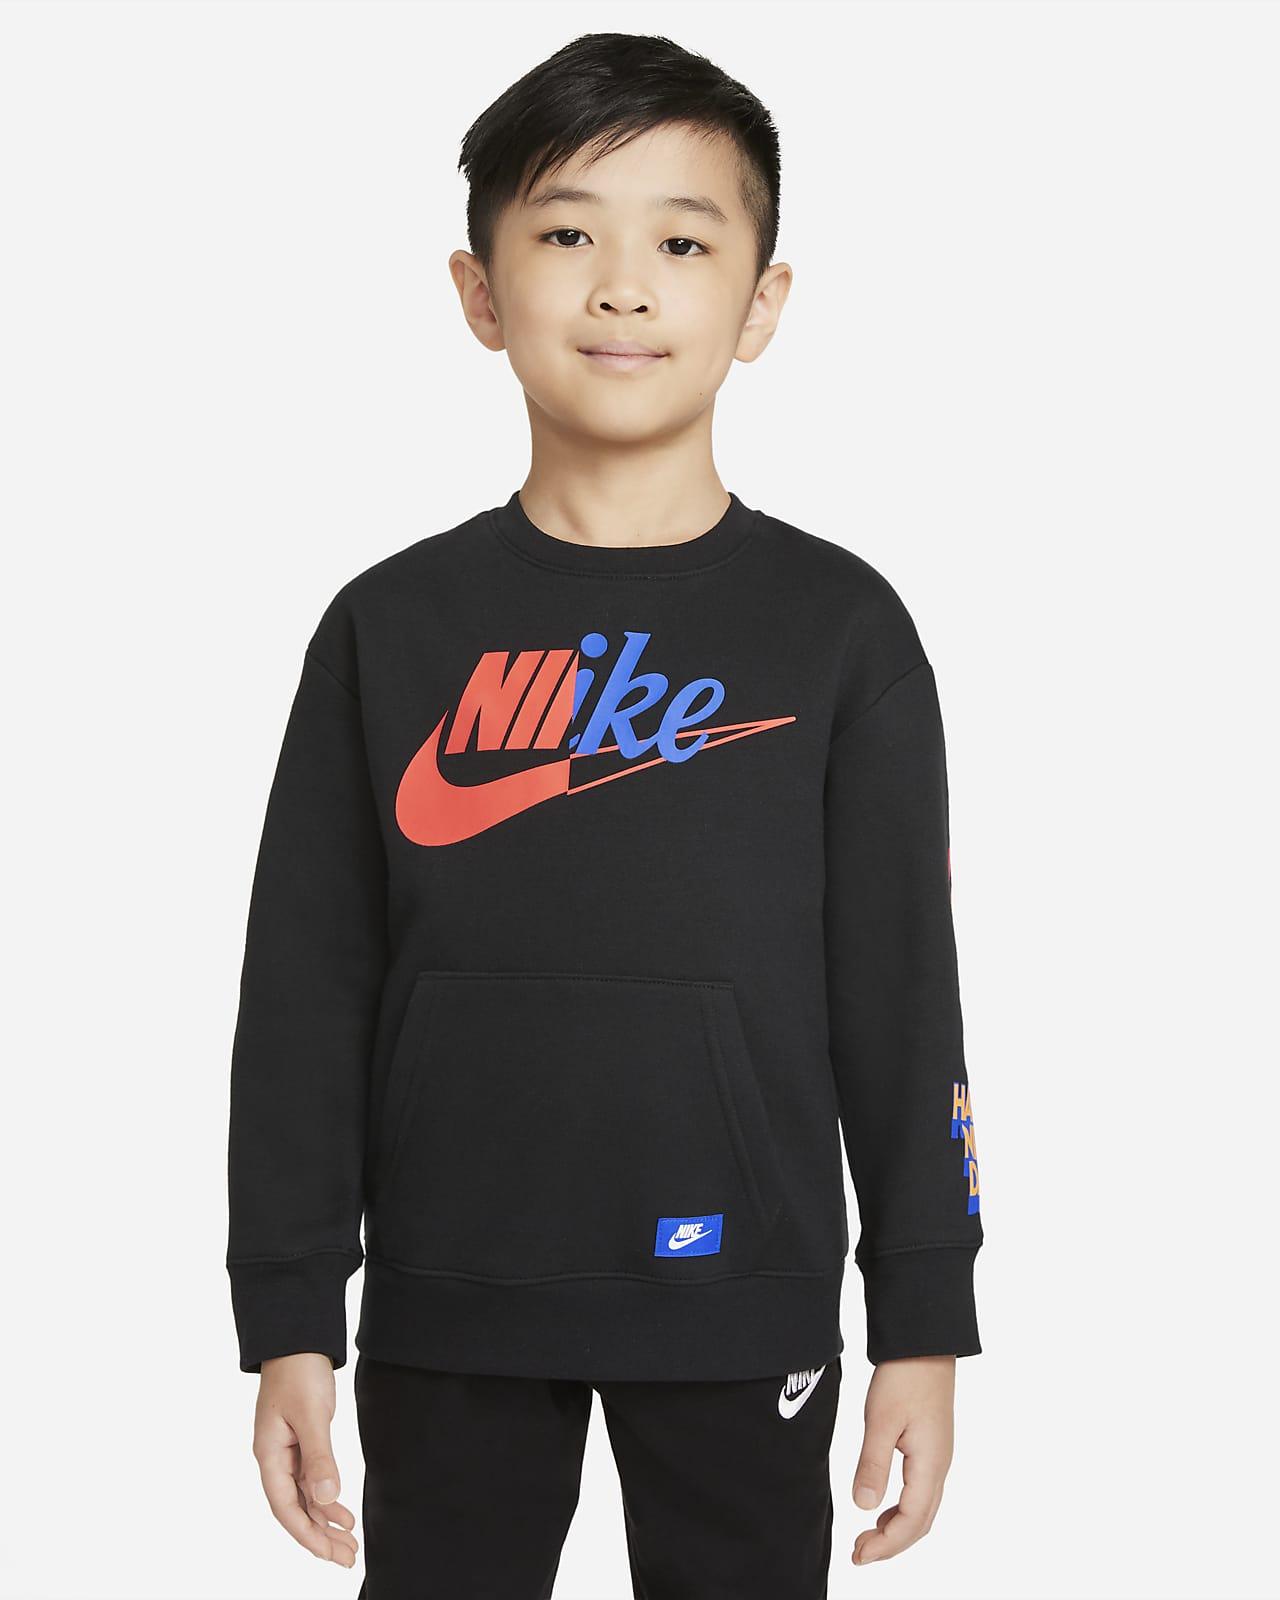 Nike 幼童运动上衣